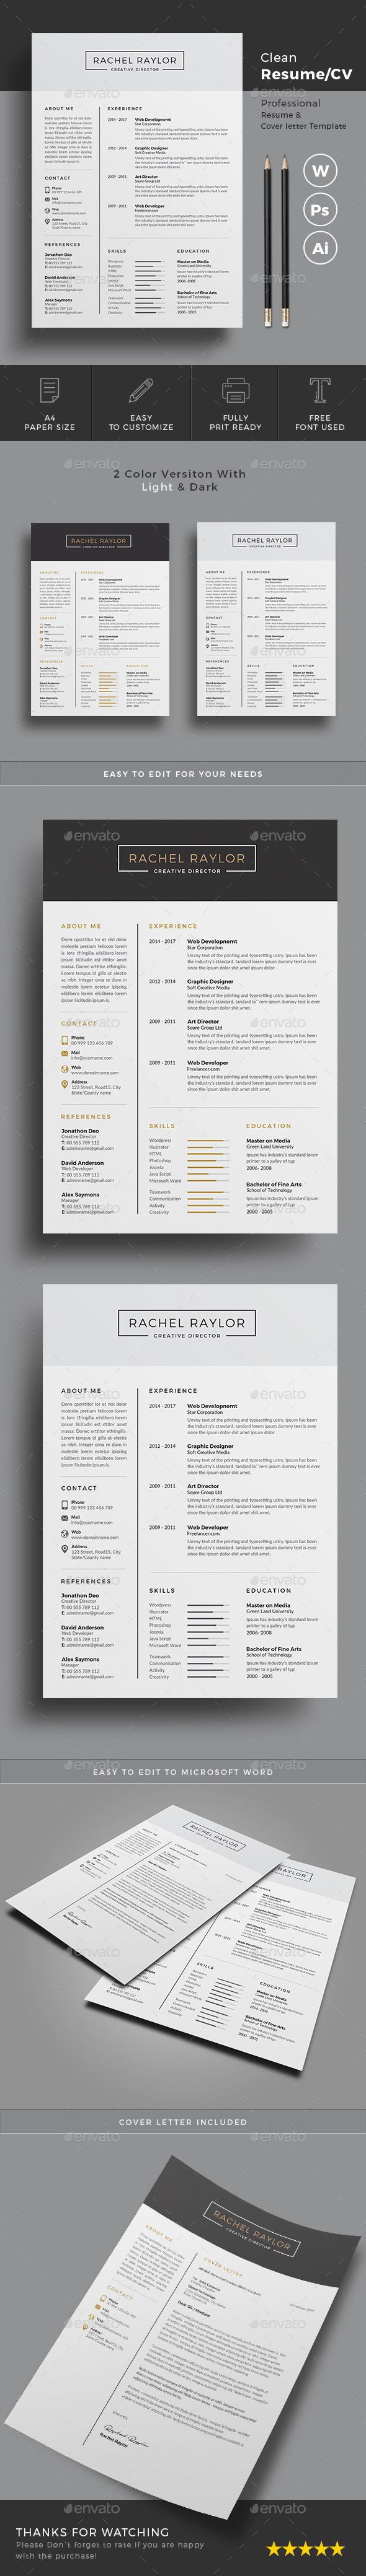 Resume | resume design | Pinterest | Tecnologia